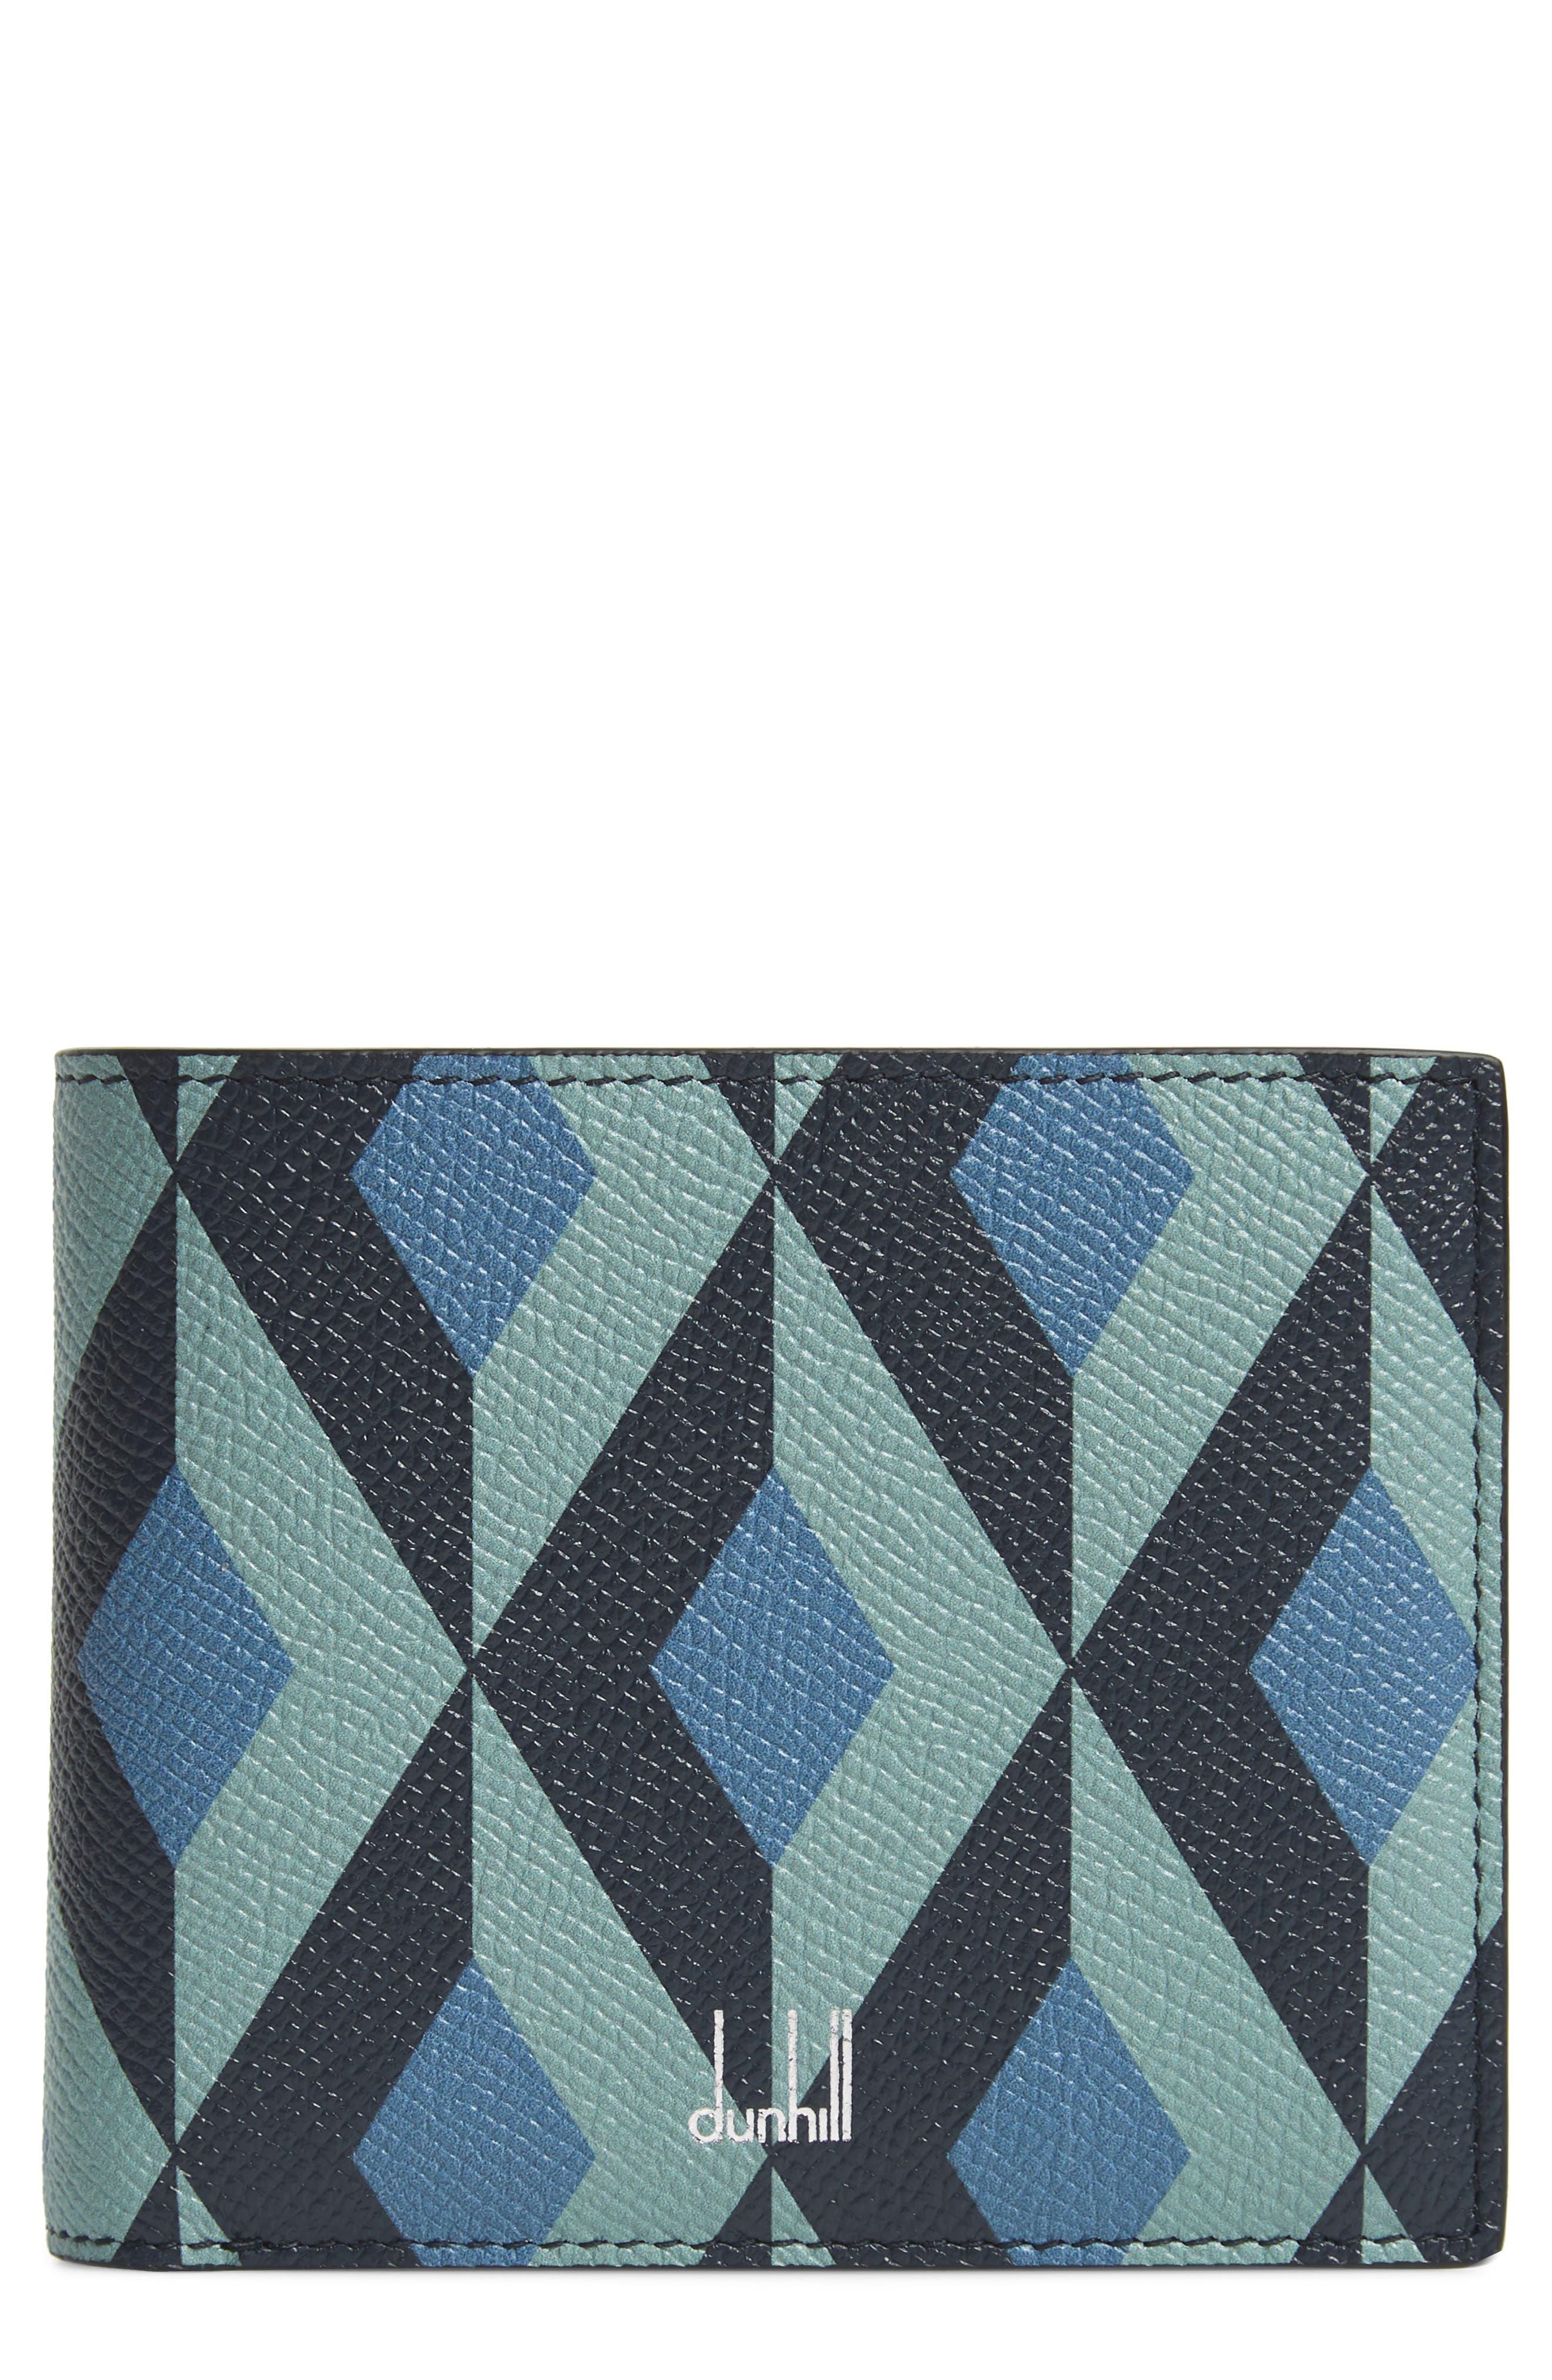 DUNHILL, Cadogan Leather Wallet, Main thumbnail 1, color, STONE BLUE